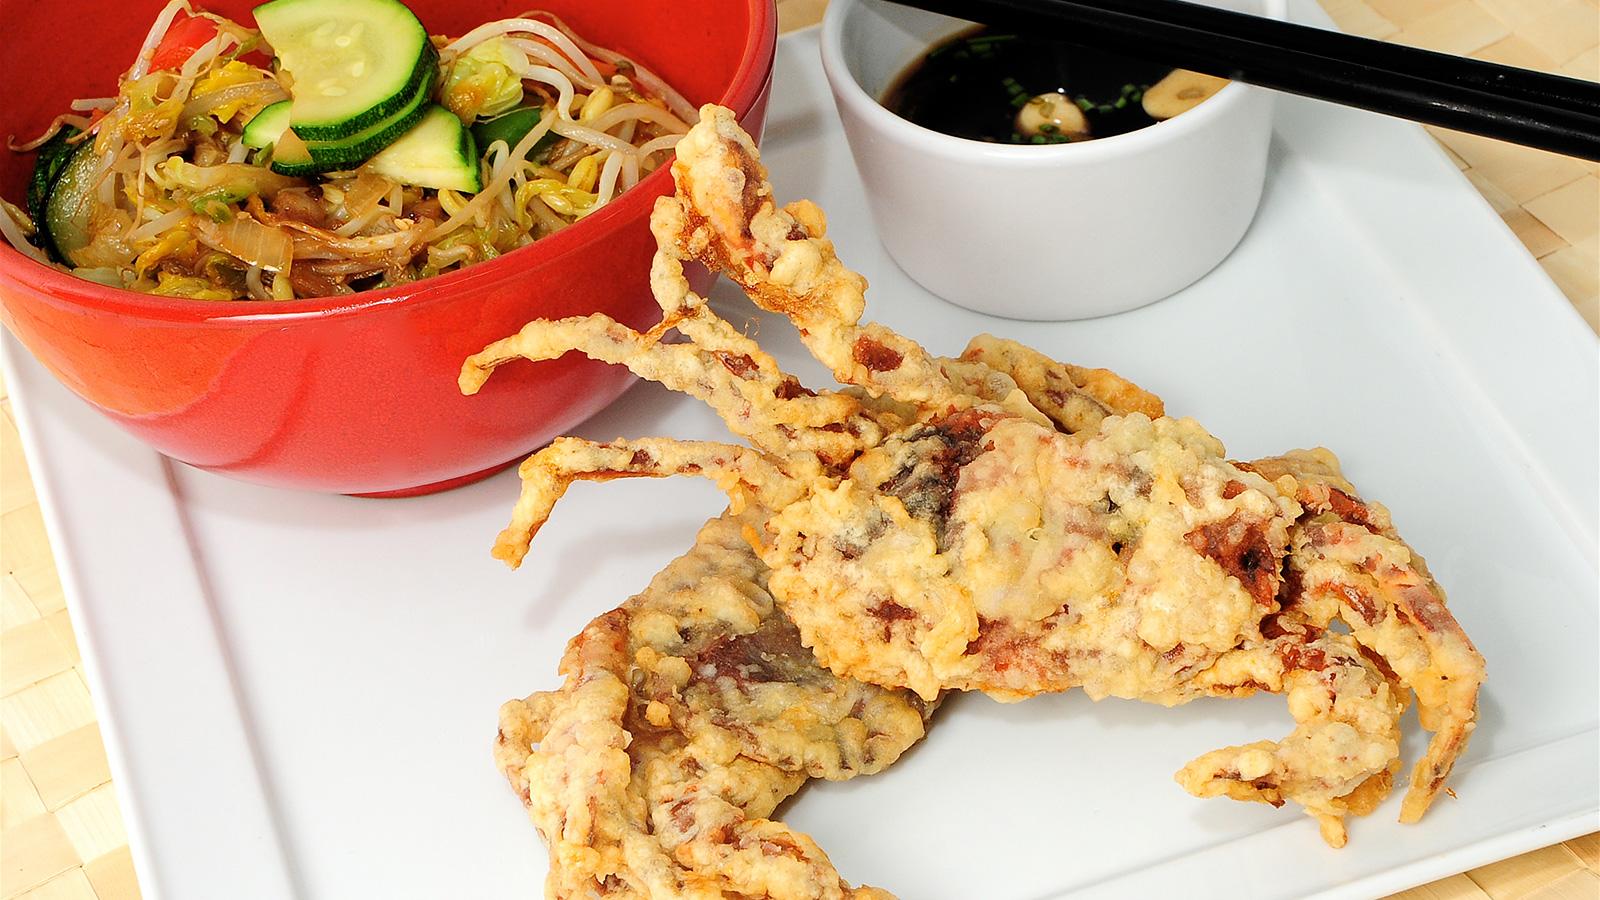 Cocinar Cangrejos De Mar | Cangrejos De Caparazon Blando Samantha Vallejo Nagera Samantha